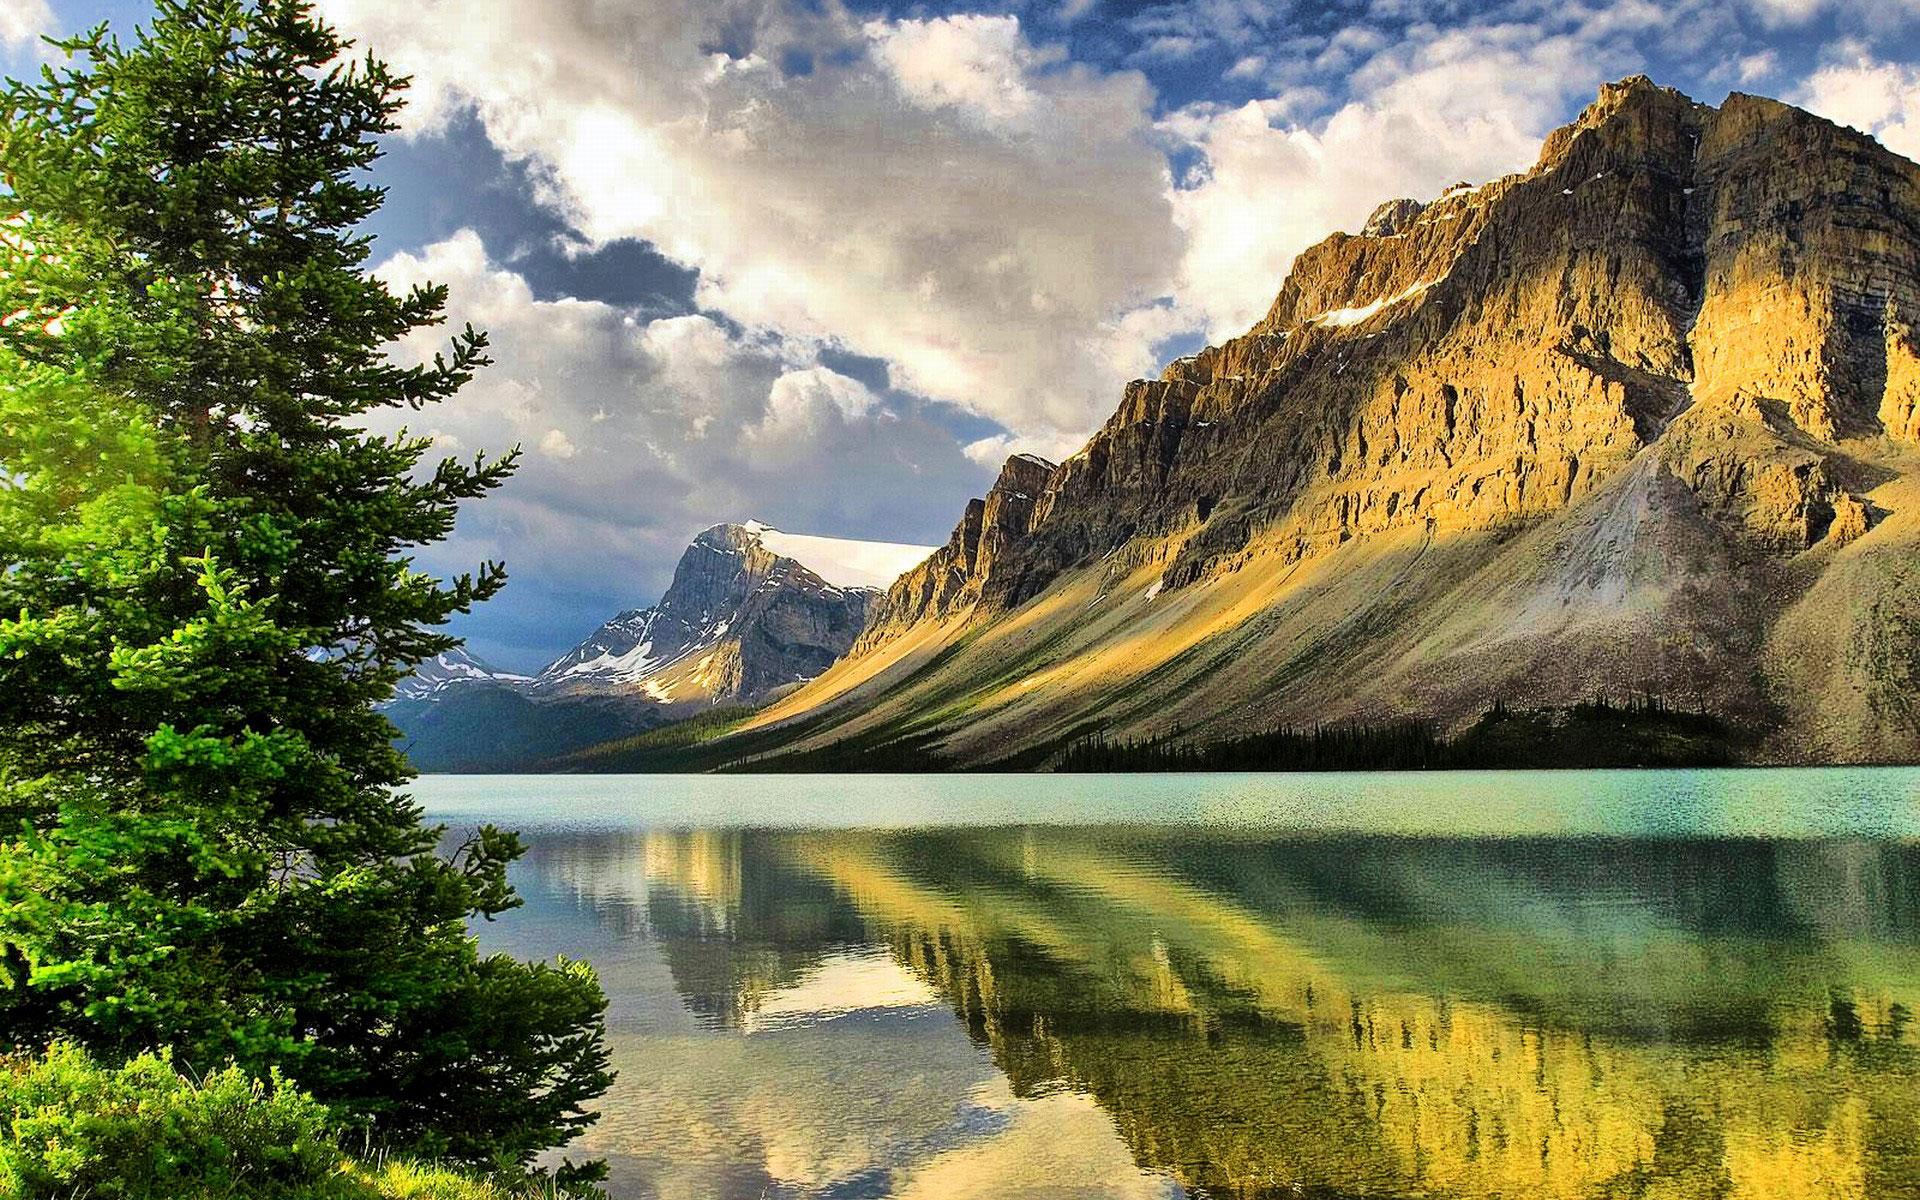 Mountains Wallpaper in HD - WallpaperSafari